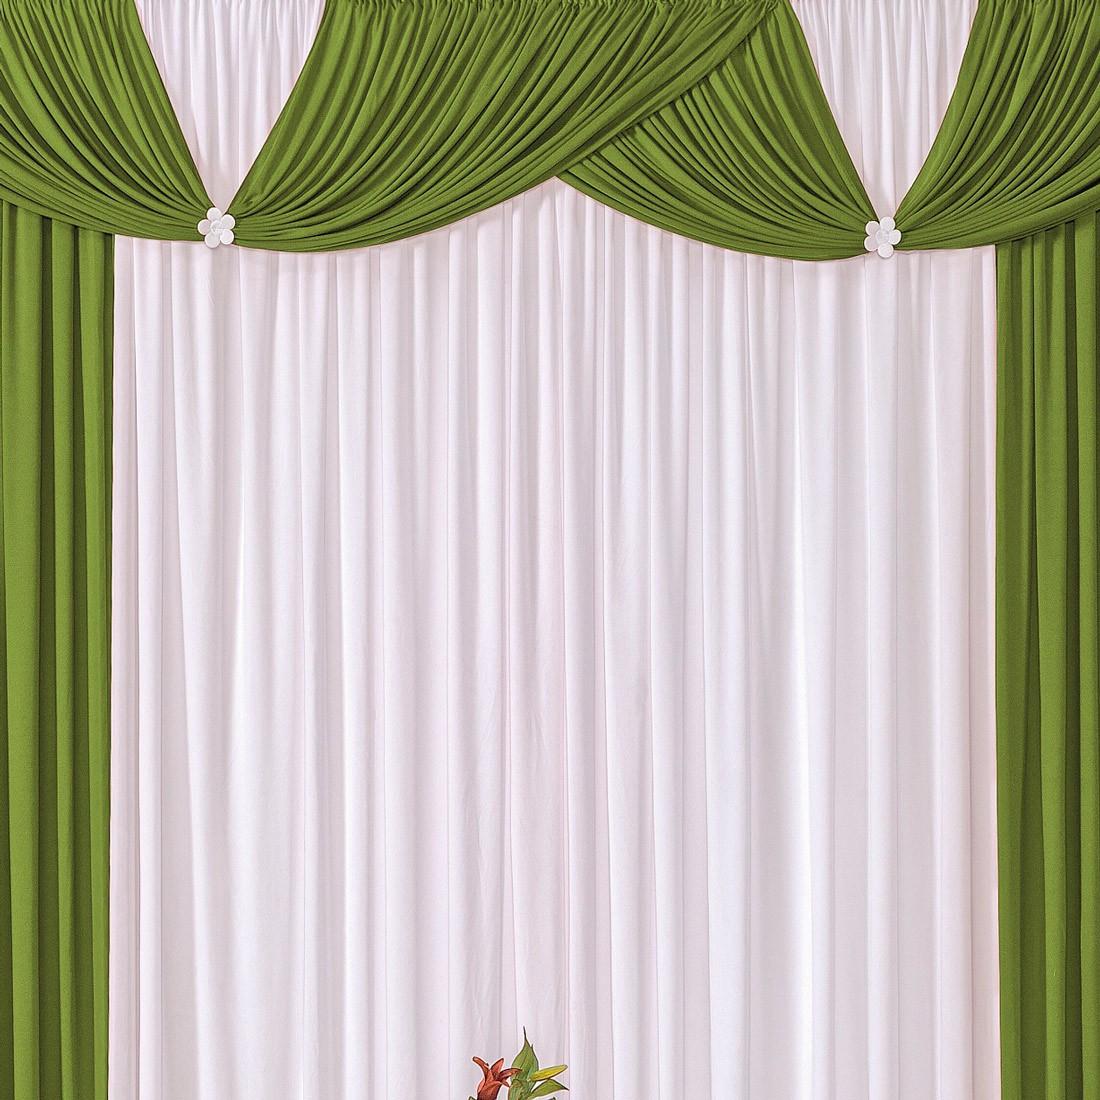 Cortina Londrina Verde/Branco 3,00m X 2,60m p/ Varão Simples